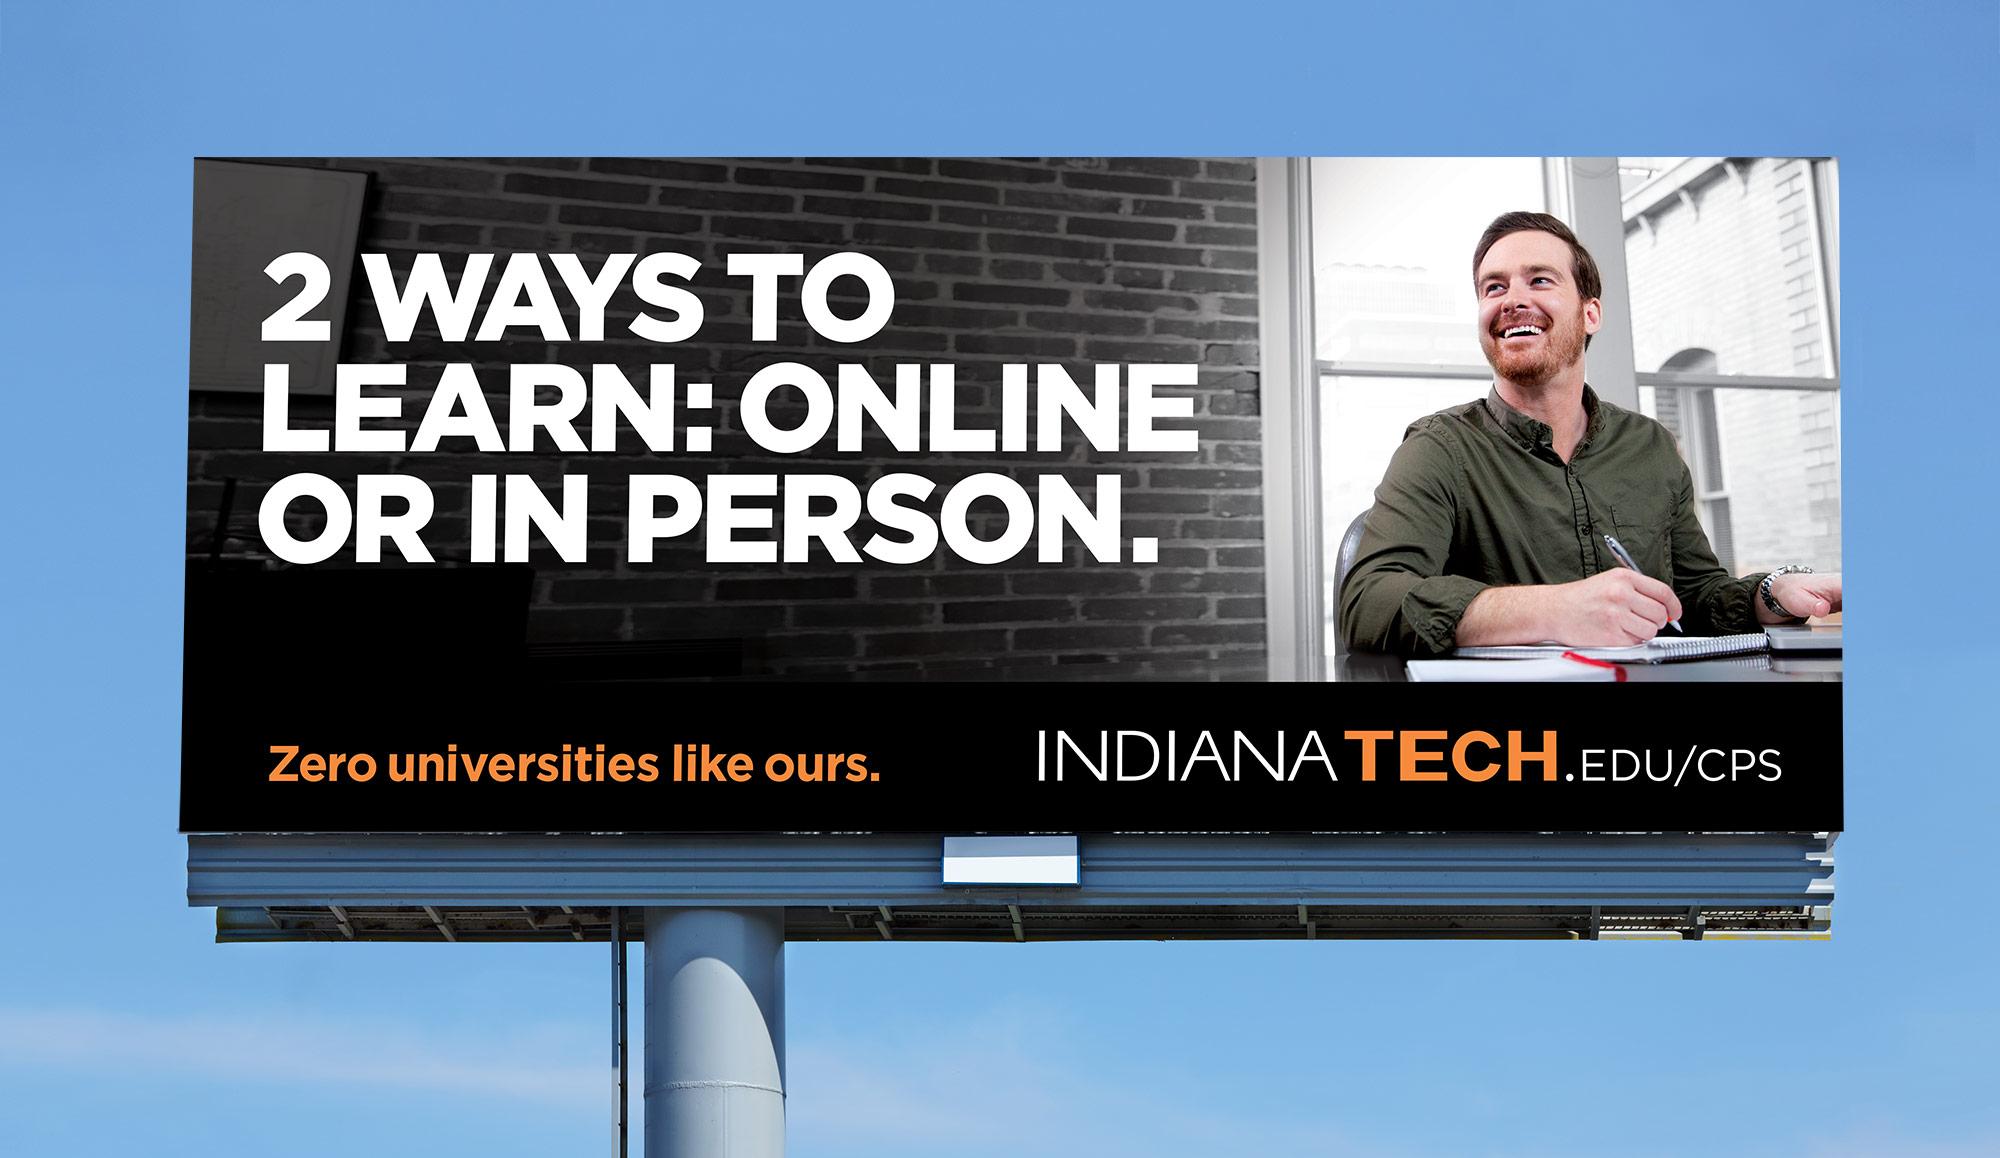 Indiana Tech: Zero Universities Like Ours outdoor